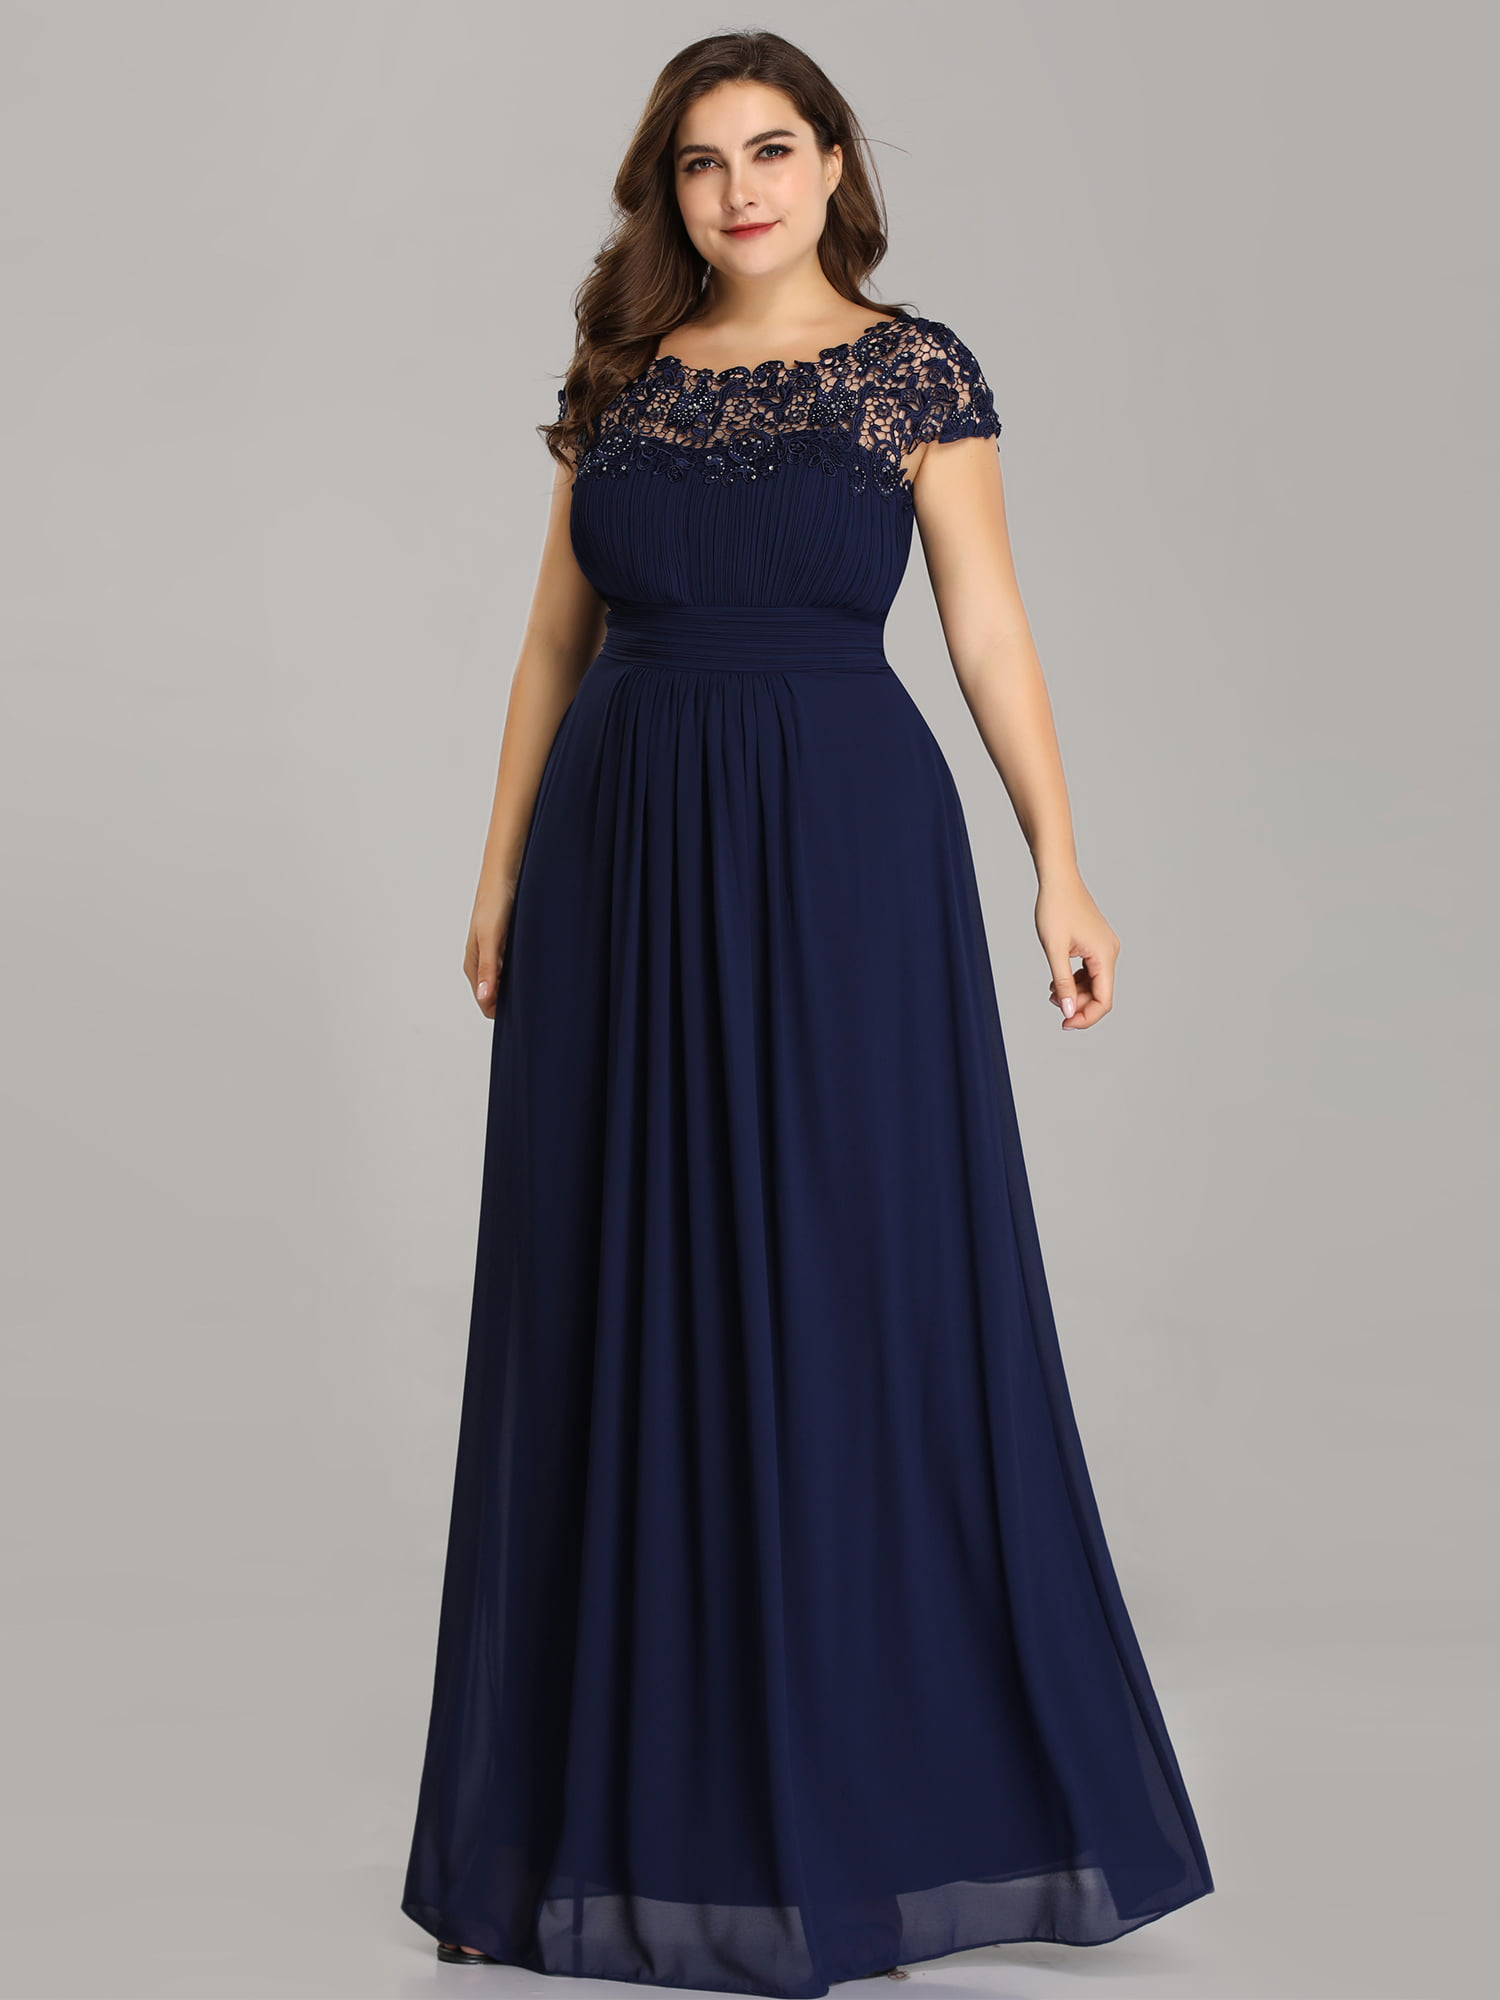 Plus Size Open Back Evening Dress